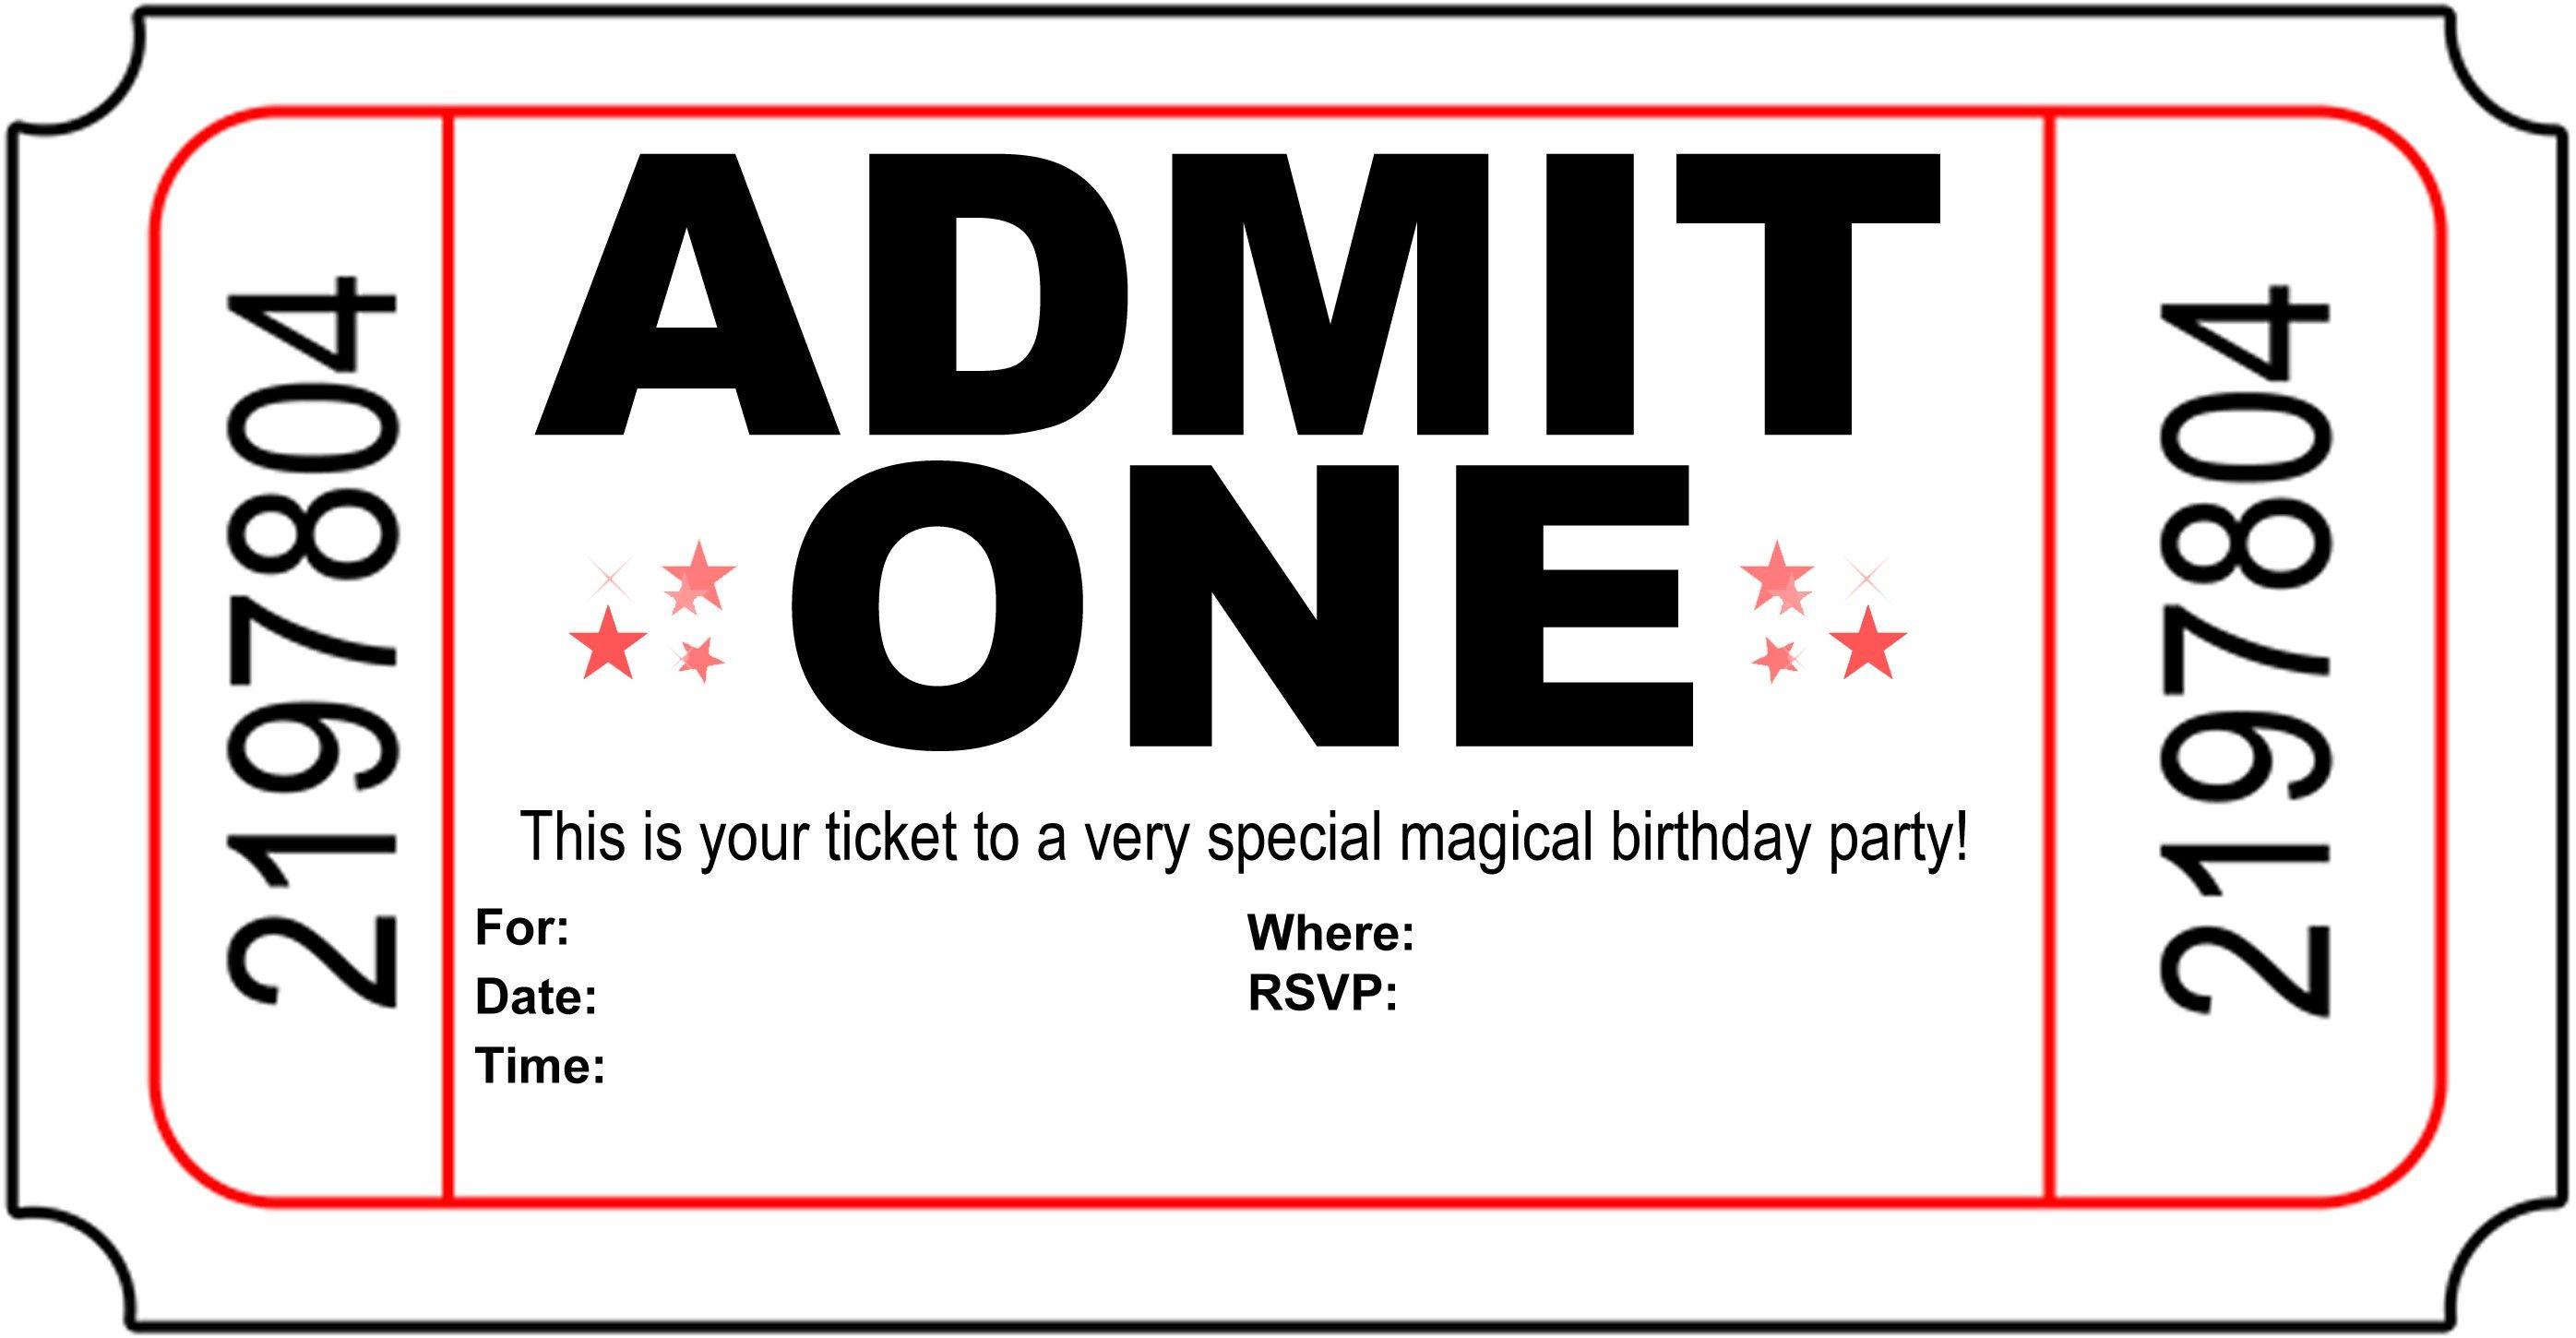 Birthday Party Invitation Free Printable   Printshop.   Pinterest - Free Printable Movie Ticket Birthday Party Invitations